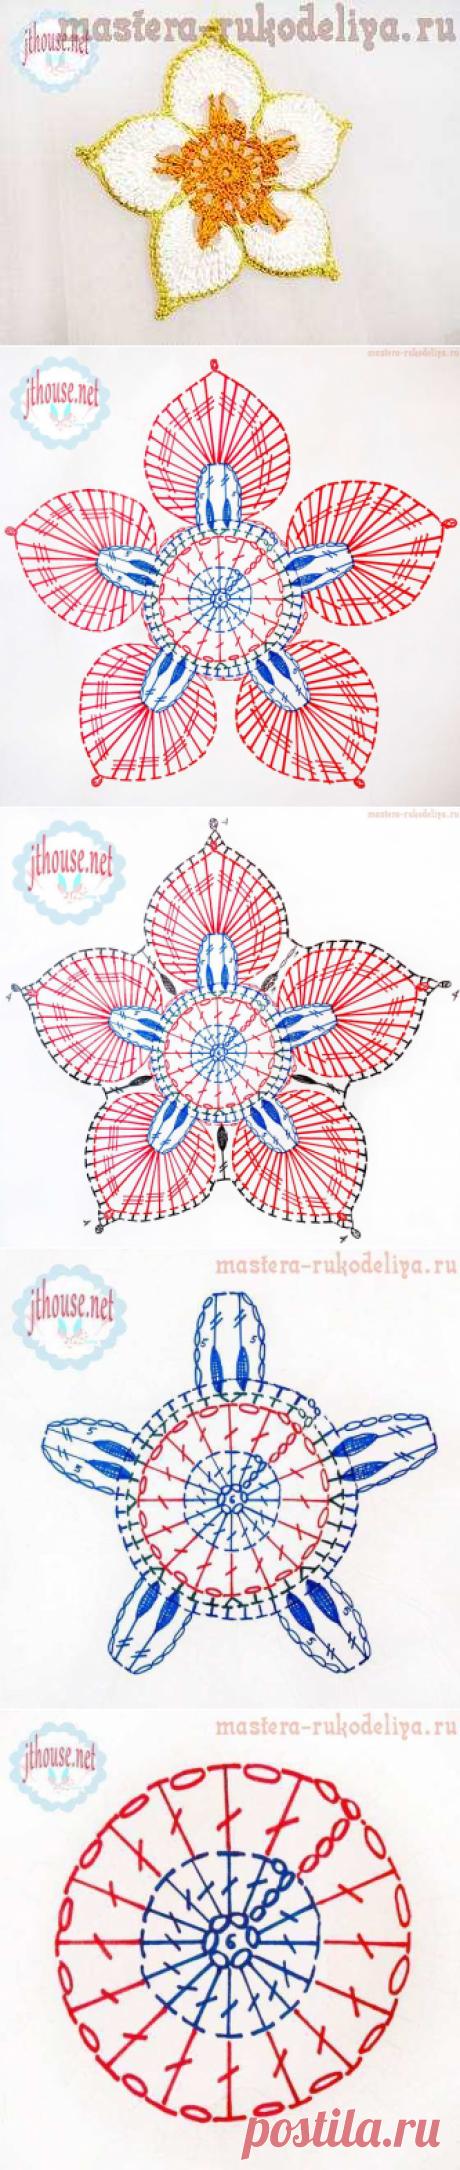 Фото и видео мастер-класс по вязанию крючком авторского мотива Цветок - талисман